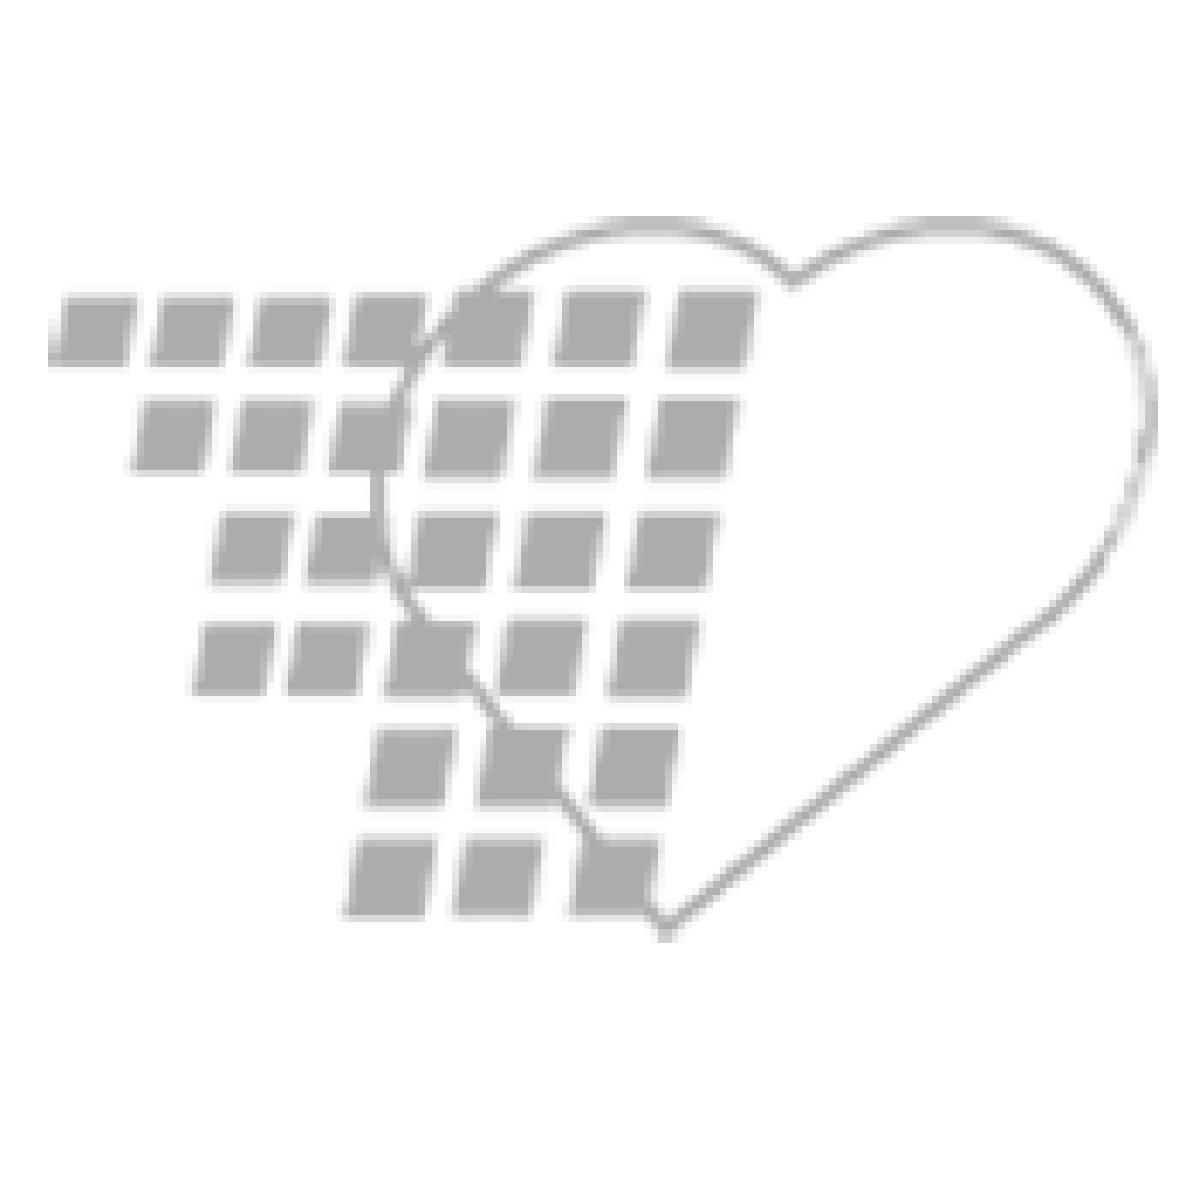 05-01-5129 MEDFIX™ Montgomery Straps Latex Free White 7-1/4 x 11-1/8 Inch